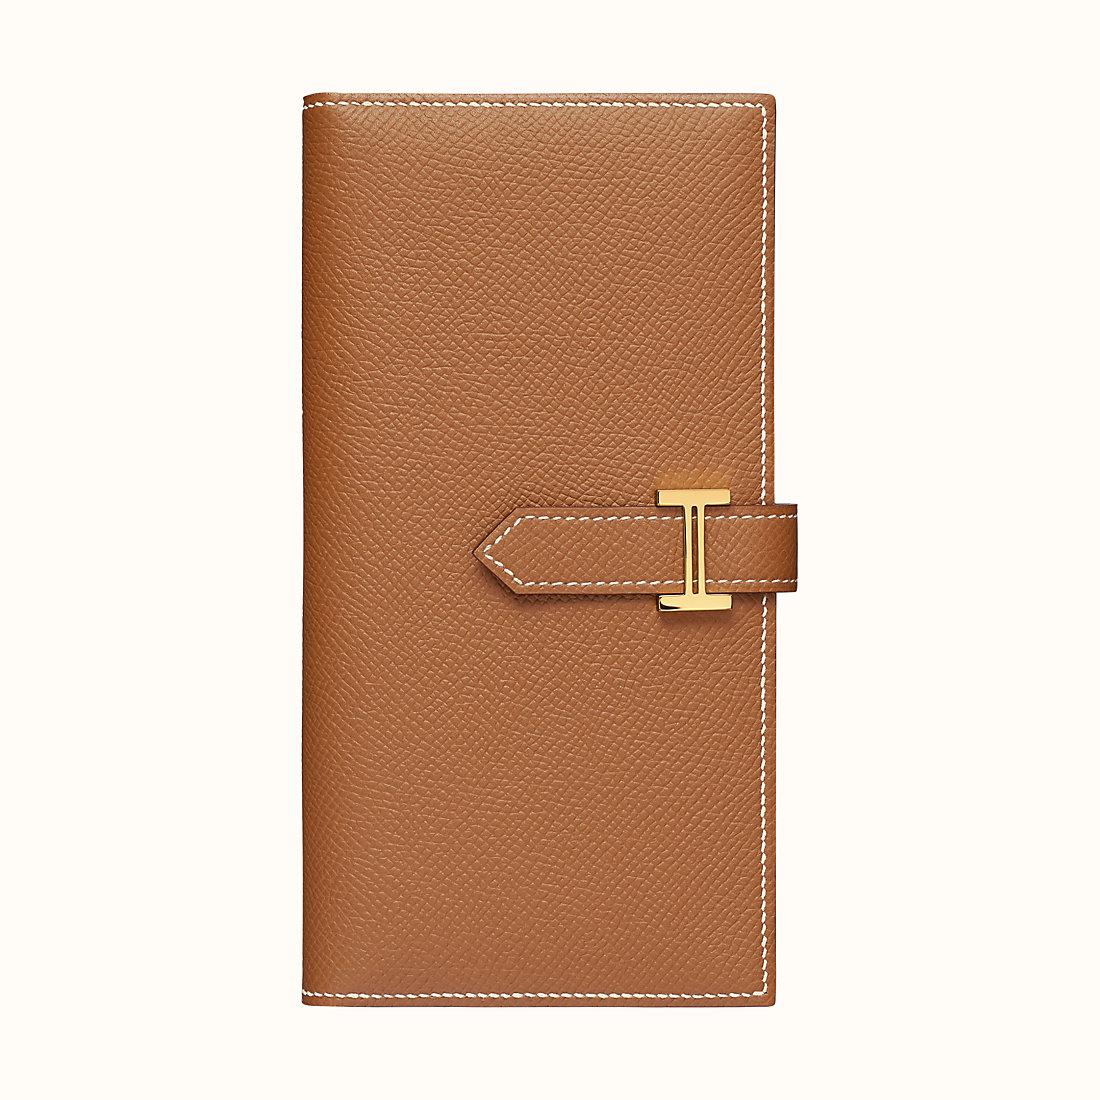 香港北區愛馬仕錢包 Hermes Bearn wallet CC37 Gold Epsom